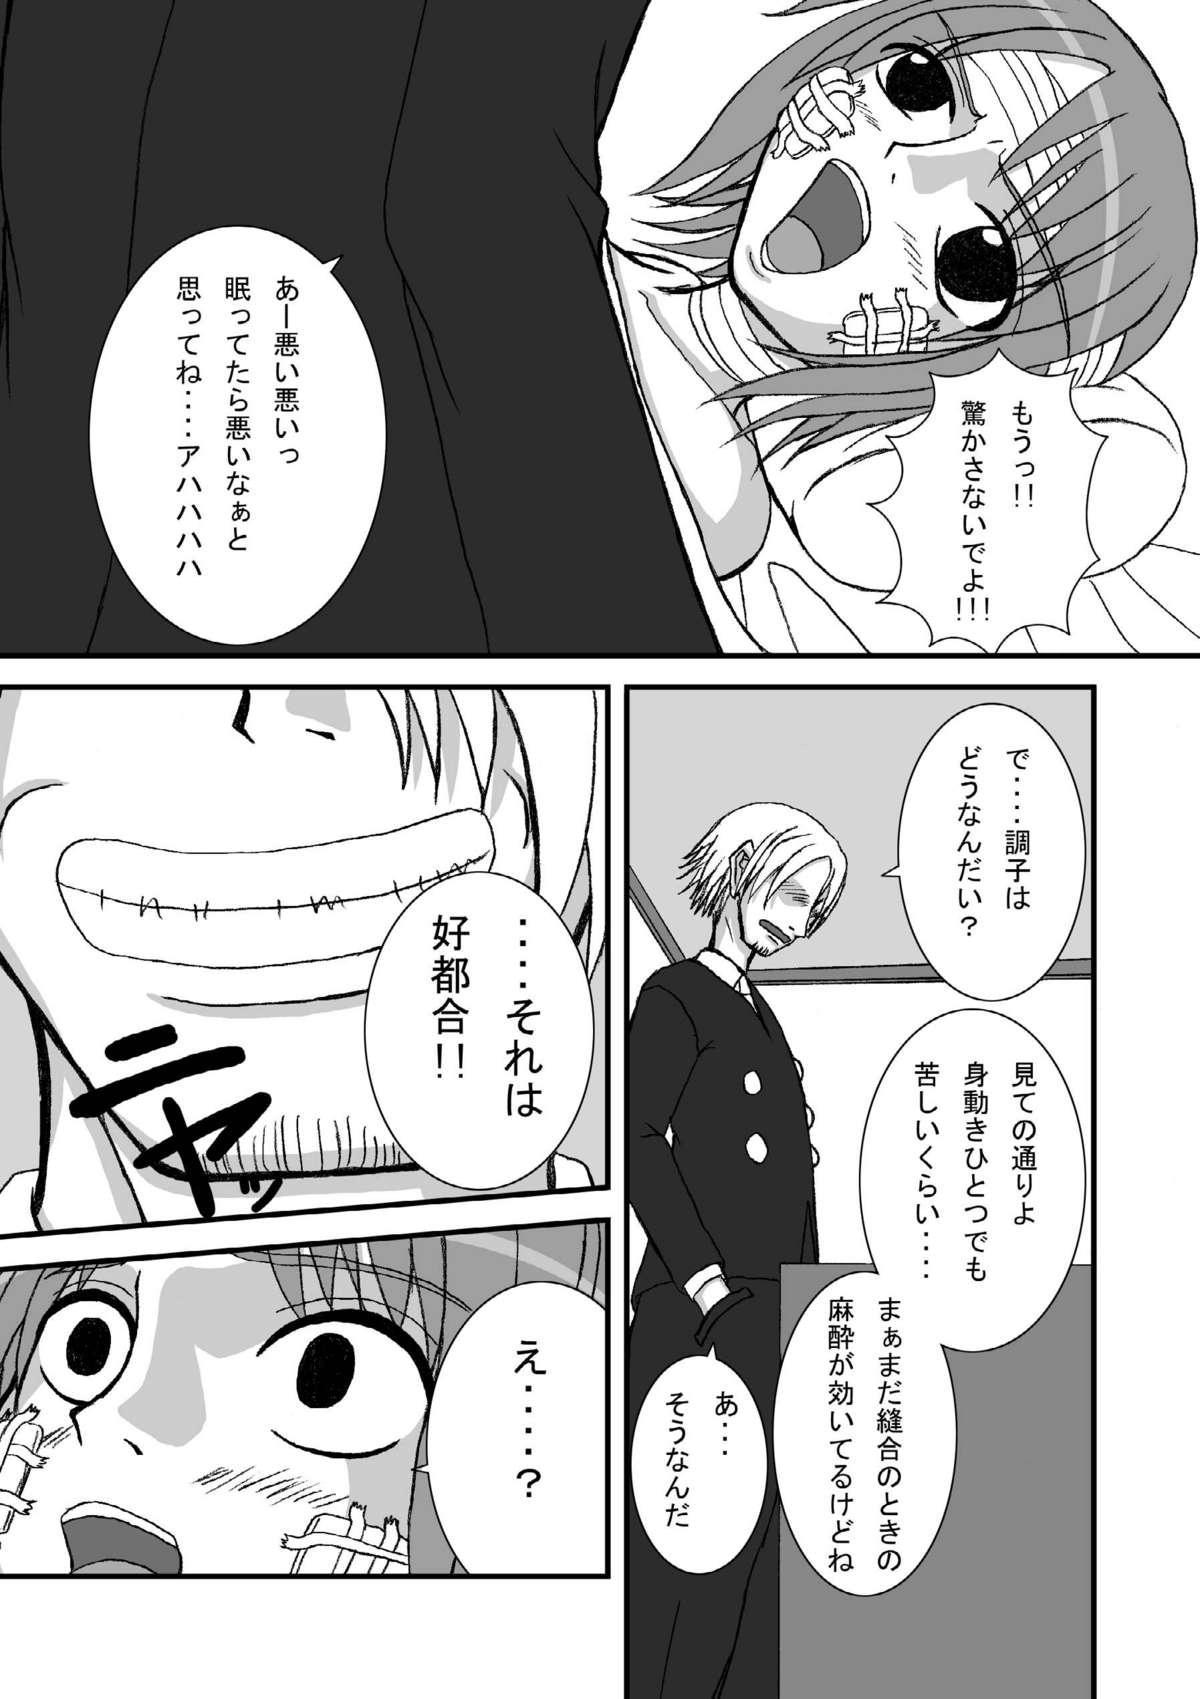 Jump Tales 4 Chou Nami Baku!! Shikyuu Koumon Bakuha Hen 4